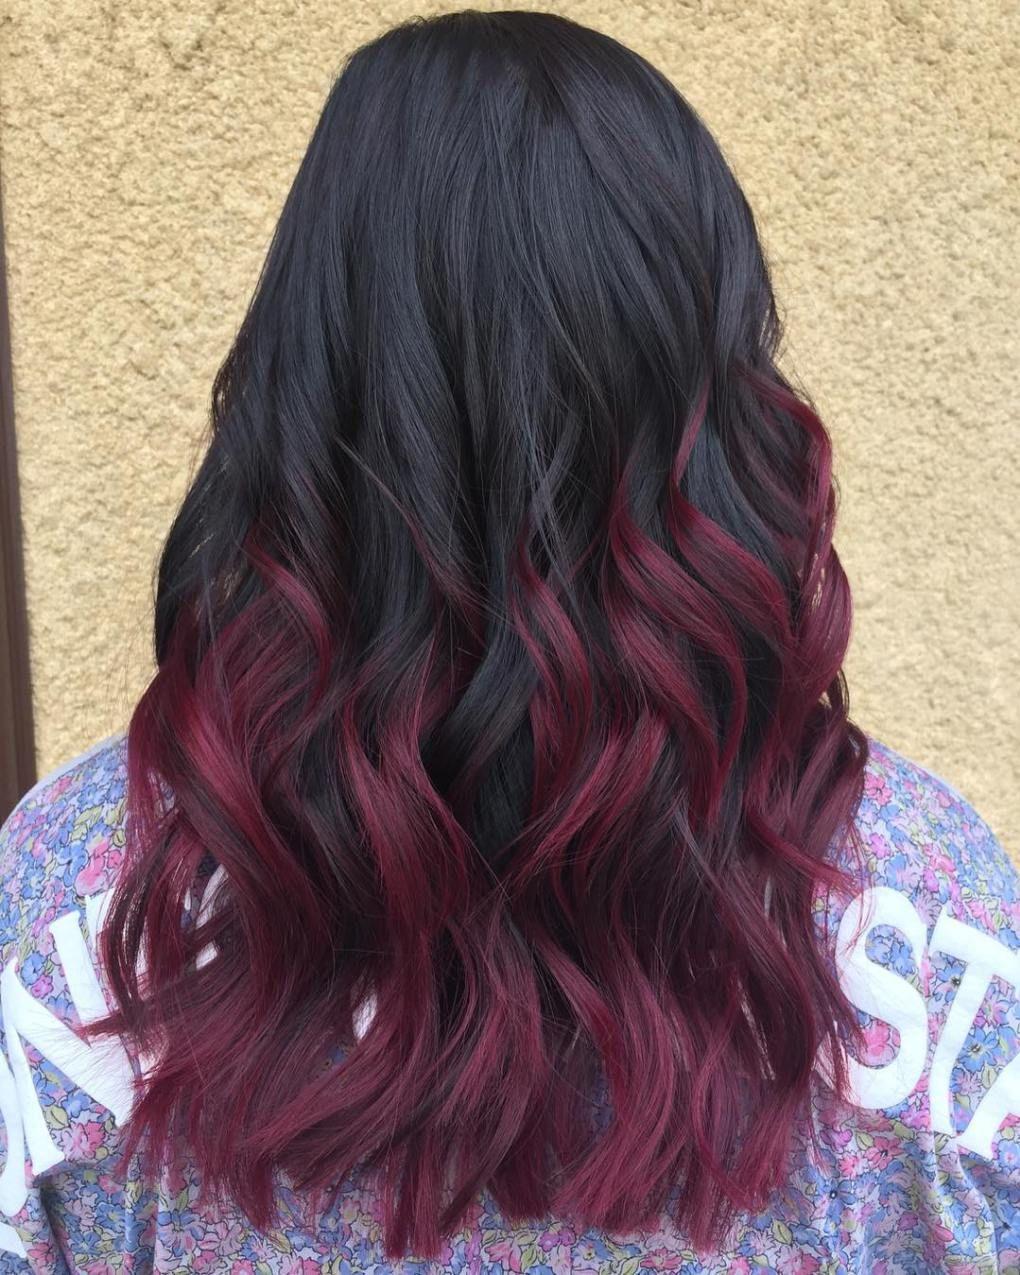 45 Shades Of Burgundy Hair Dark Burgundy Maroon Burgundy With Red Purple And Brown Highlights Hair Color For Black Hair Black Hair With Highlights Hair Color Burgundy